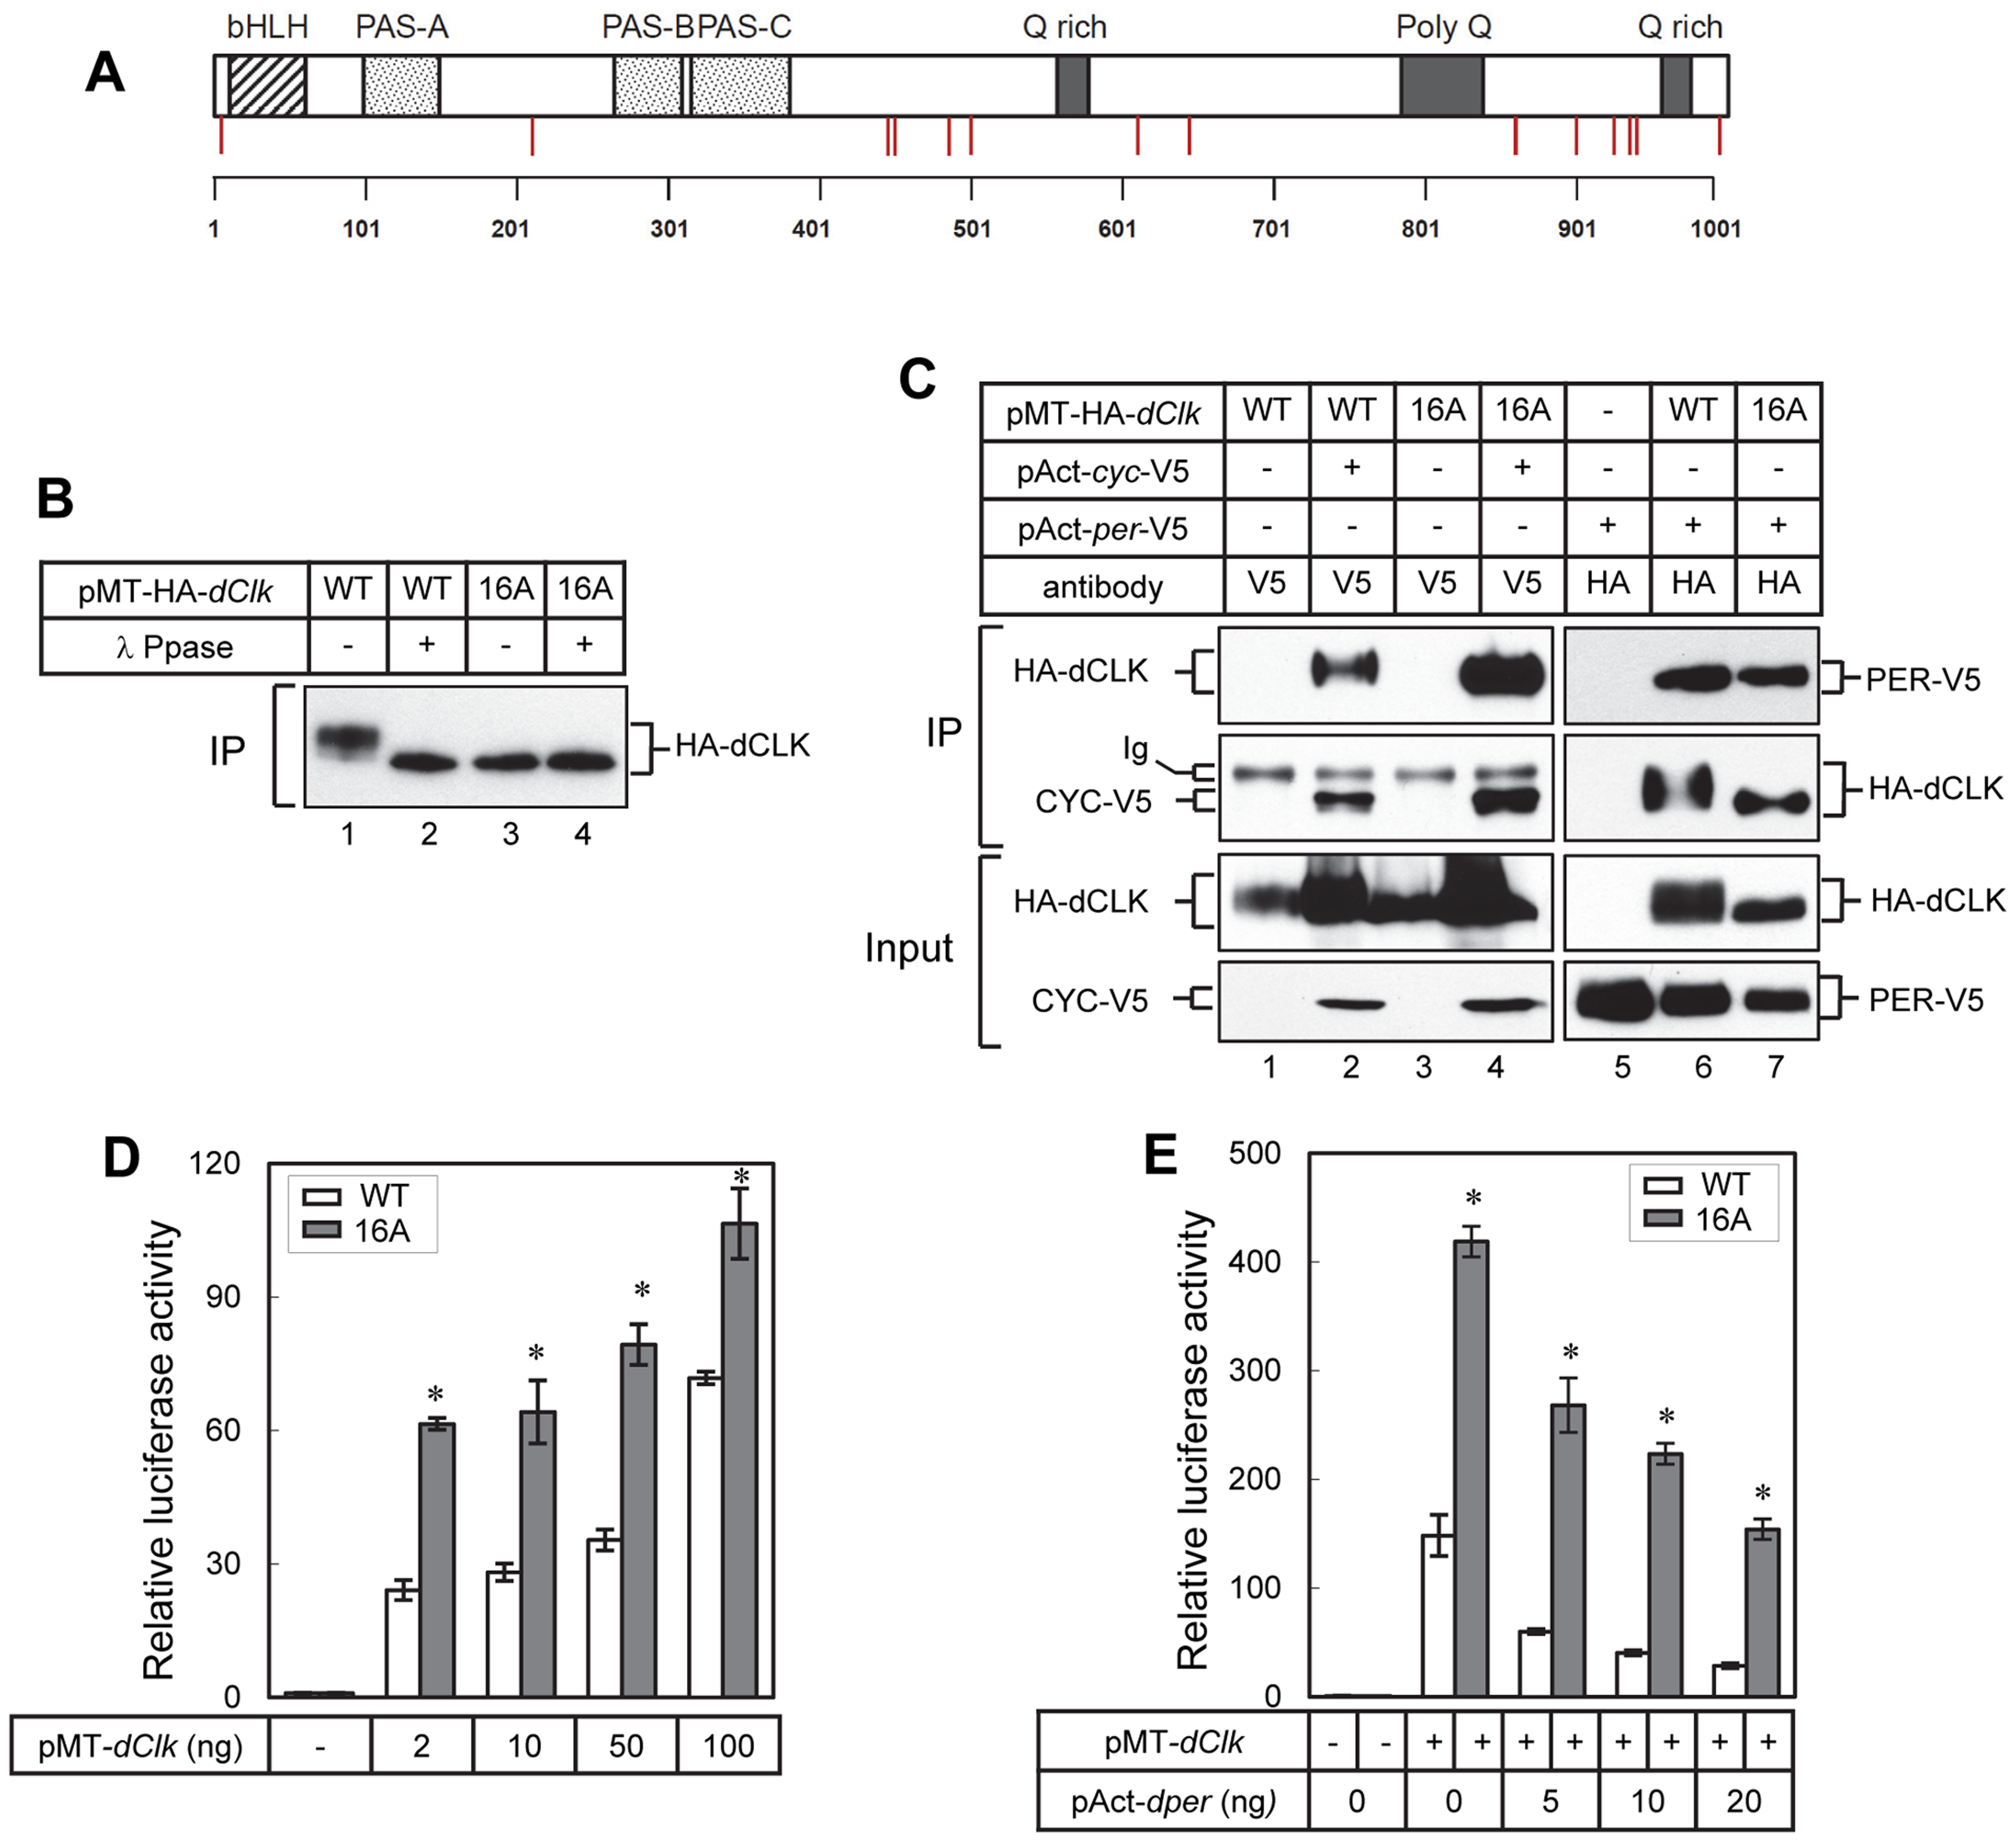 Blocking phosphorylation at multiple phospho-sites on dCLK prevents global phosphorylation but does not impair several key clock-relevant activities.